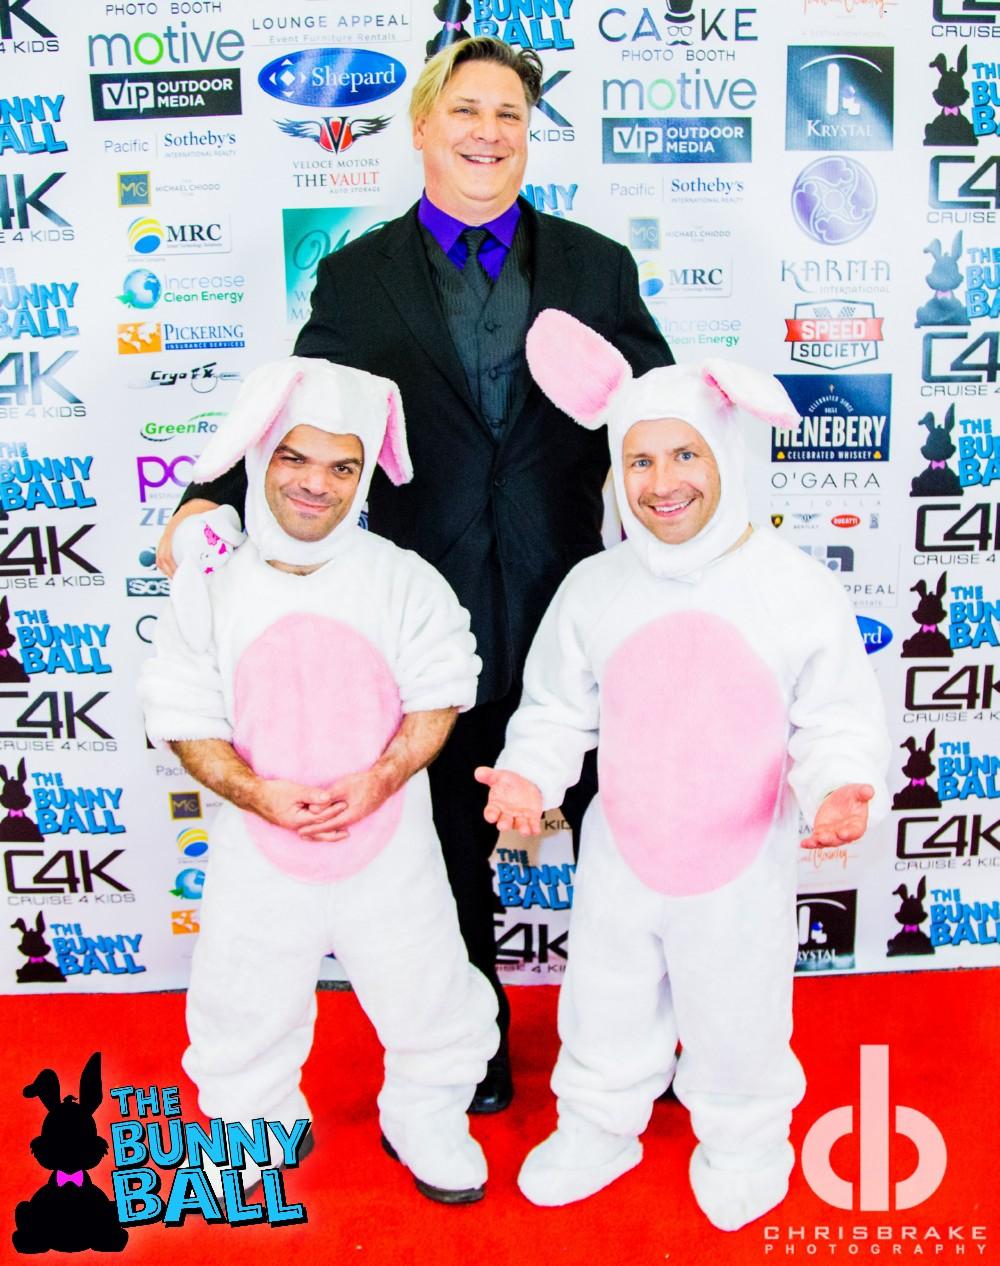 Bunny-Ball-2018-Chris-Brake- 96.jpg